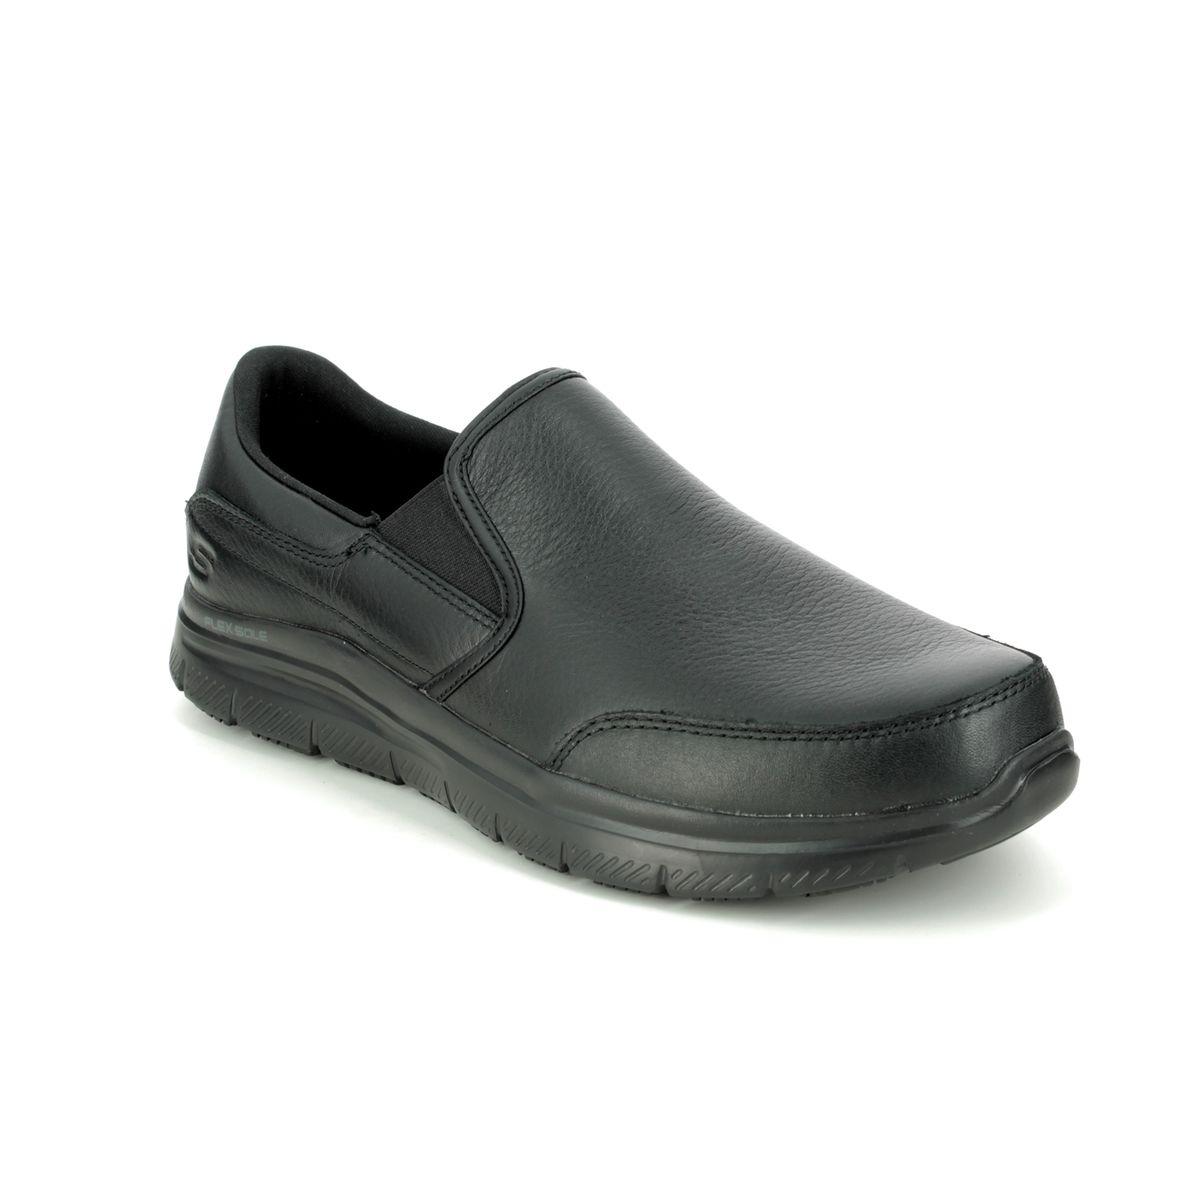 Seguro grua Brillante  Skechers Work Leather Slip Resistant 77071EC BLK Black Slip-on Shoes